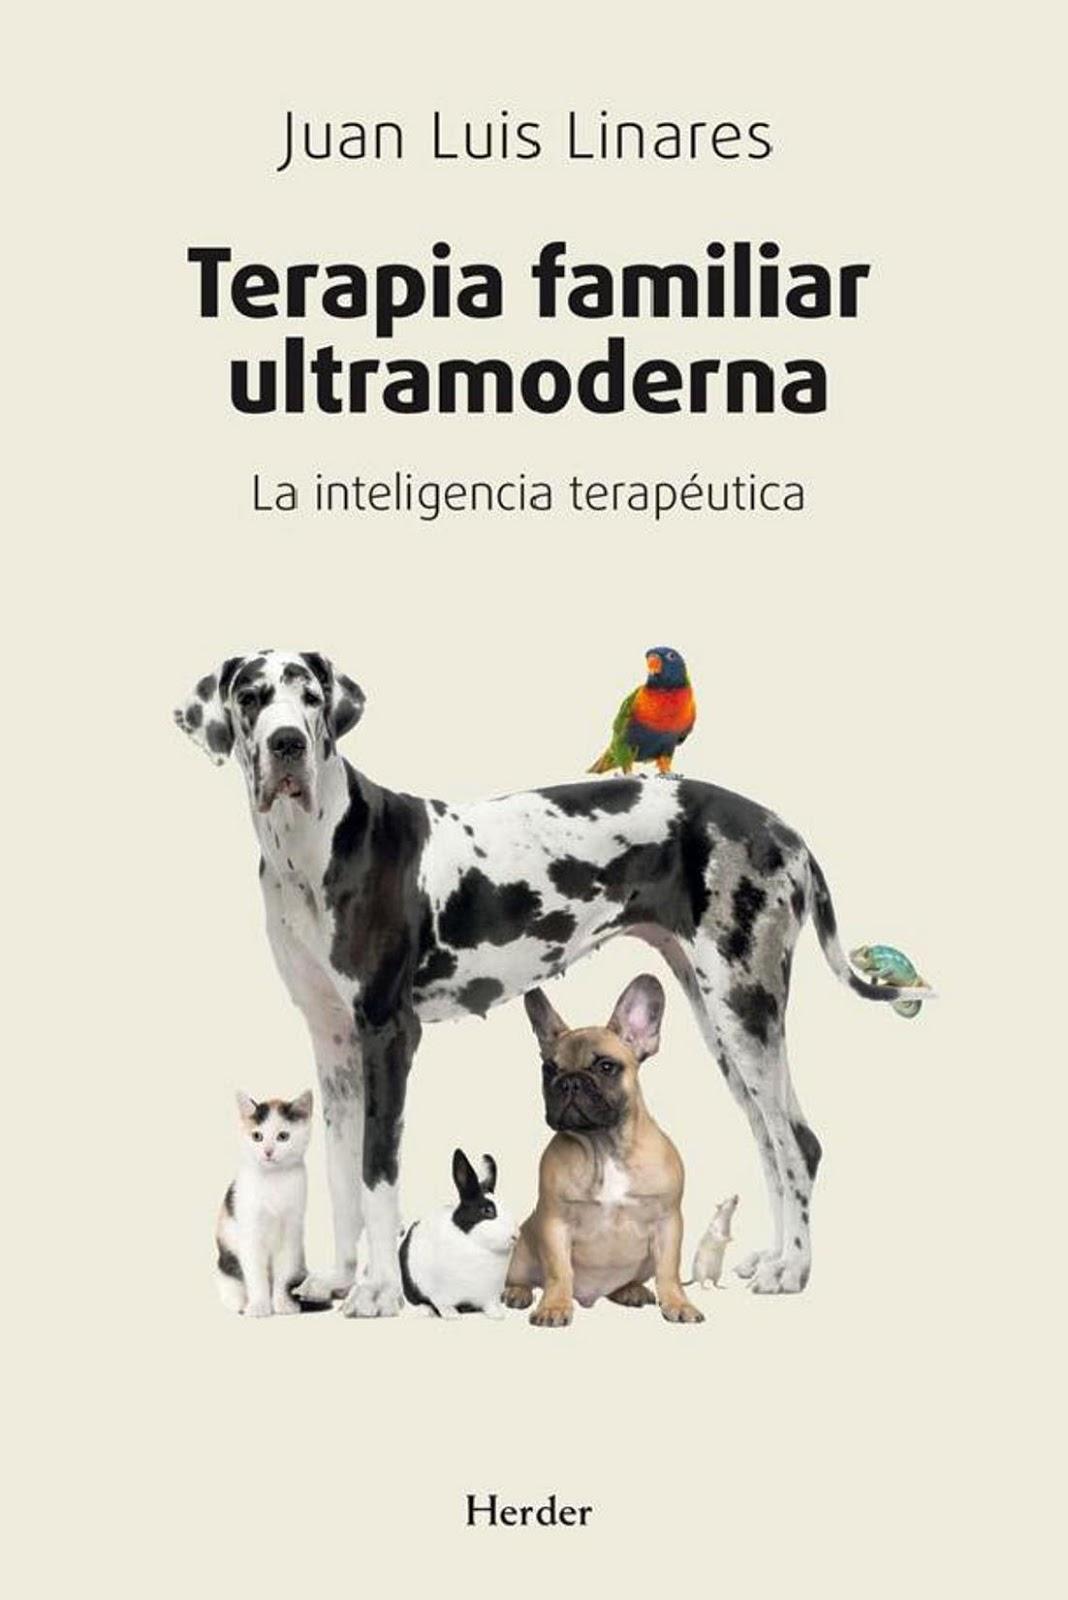 Terapia familiar ultramoderna: La inteligencia terapéutica – Juan Luis Linares